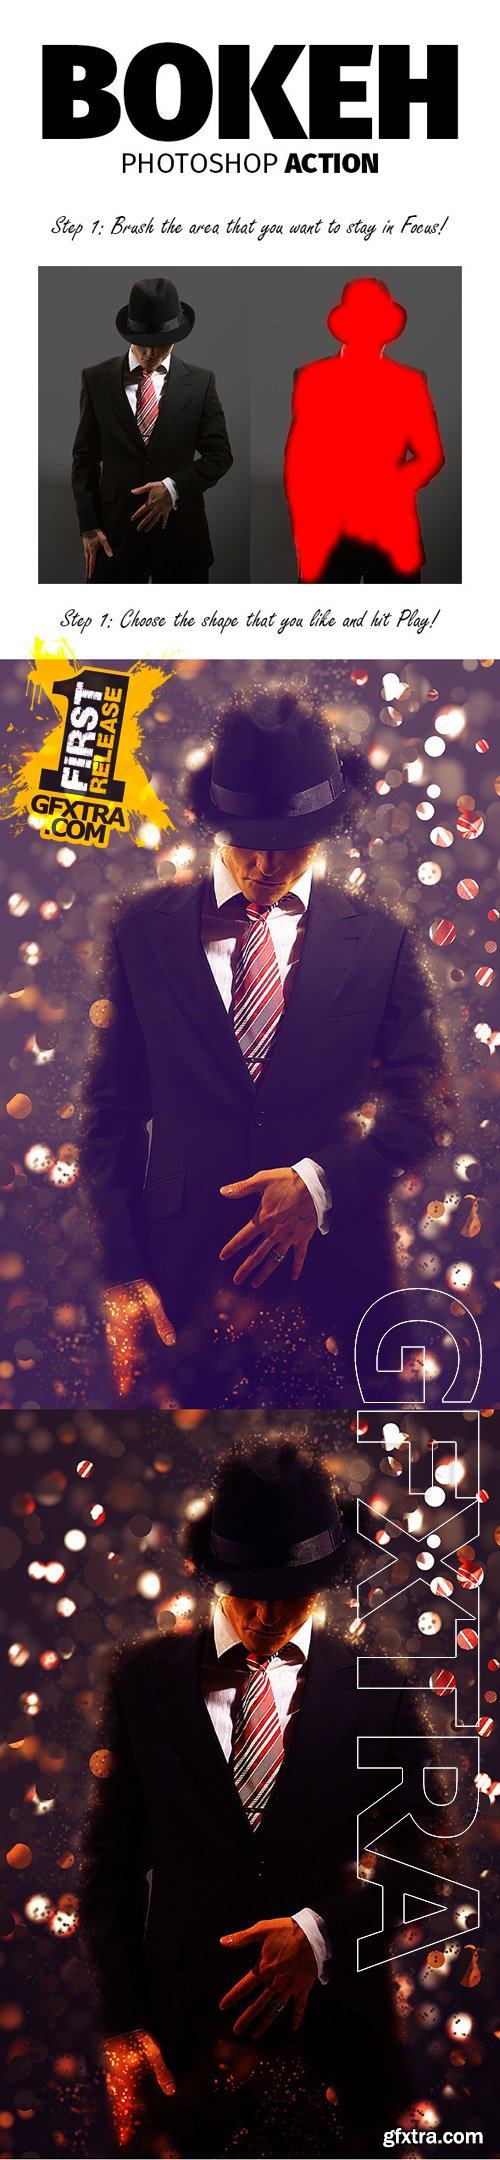 GraphicRiver - Bokeh Photoshop Action 9724816